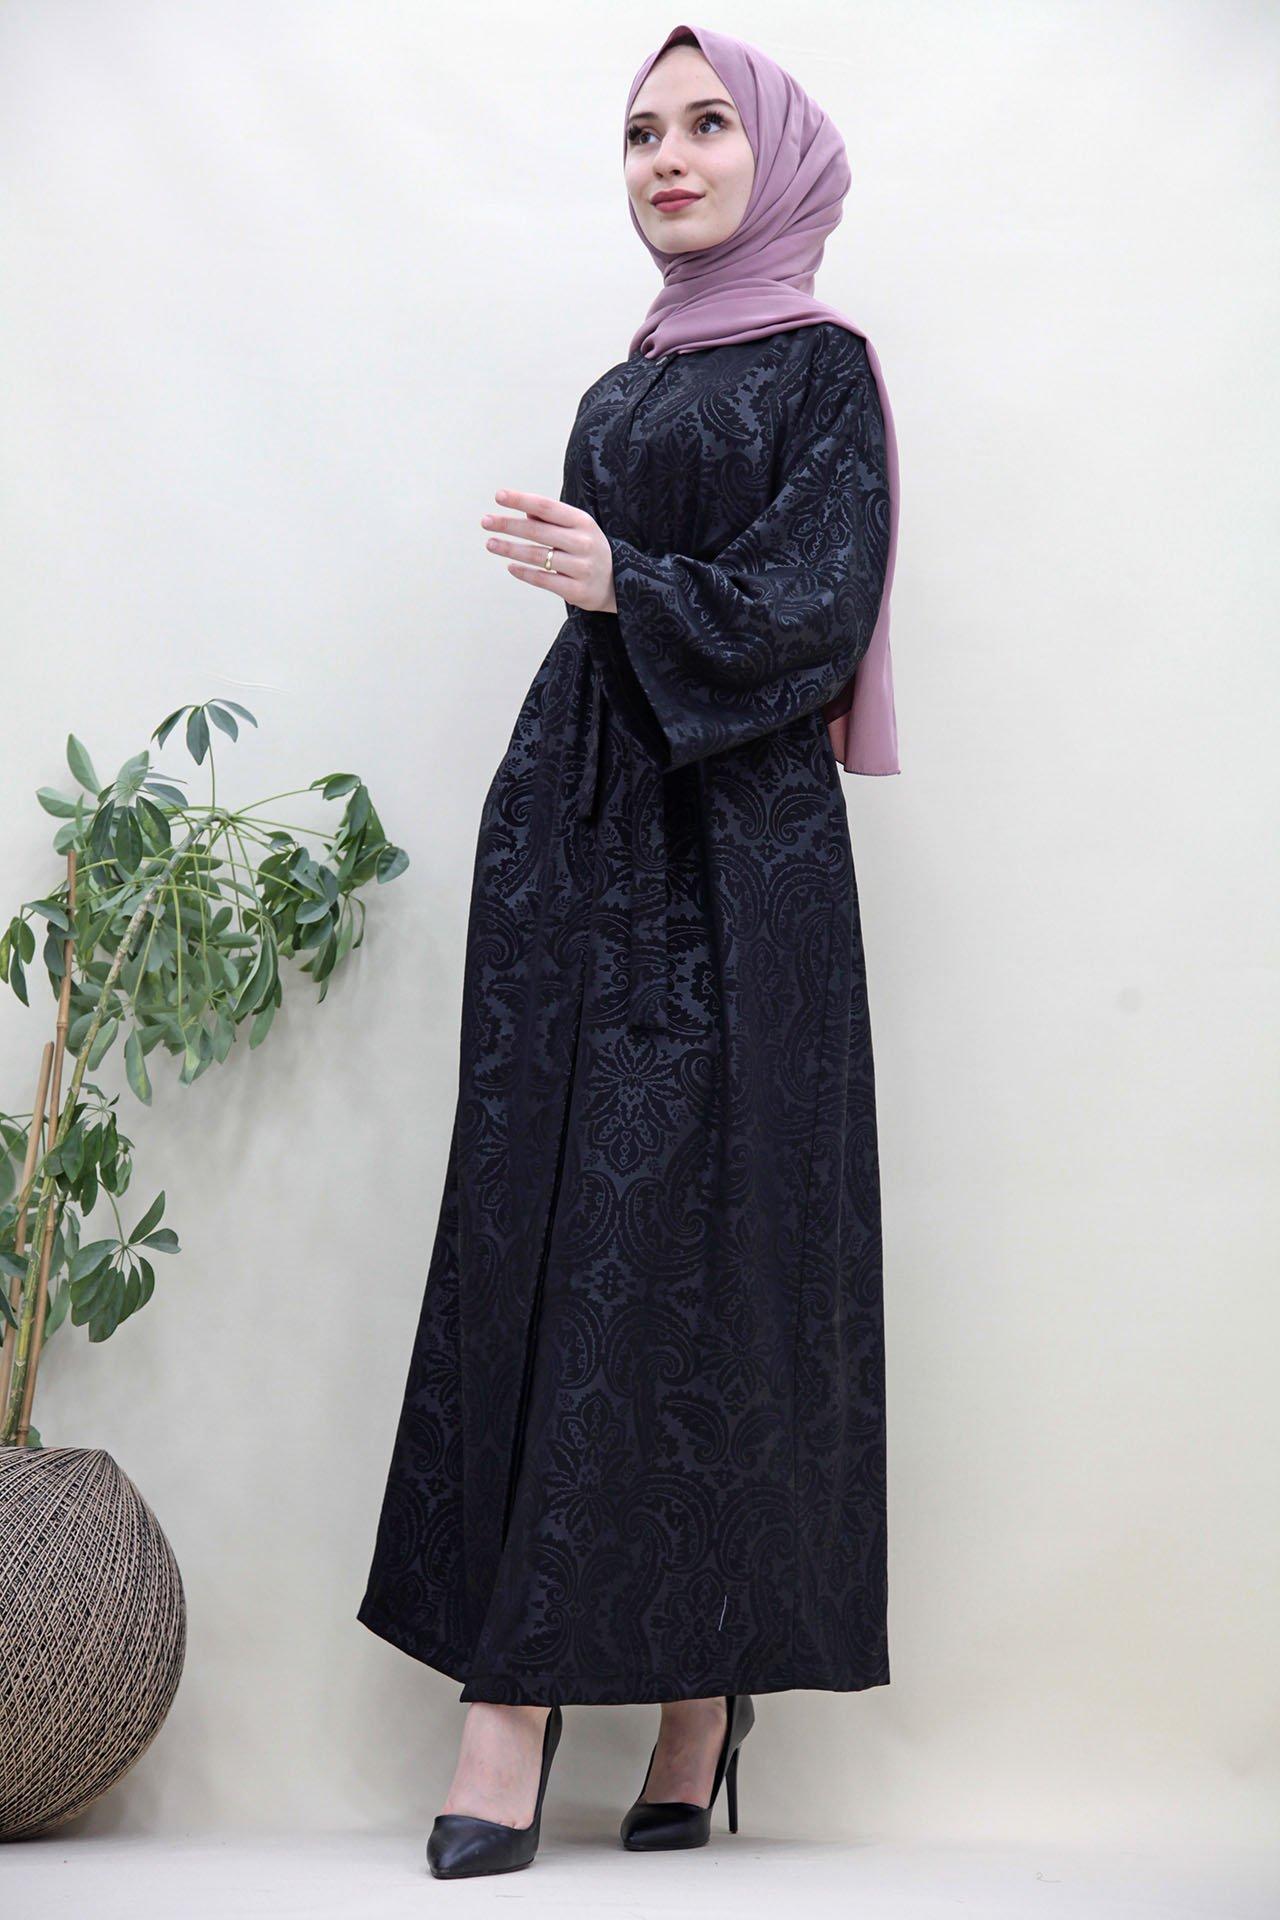 GİZAGİYİM - Retro Desen Ferace Elbise Siyah